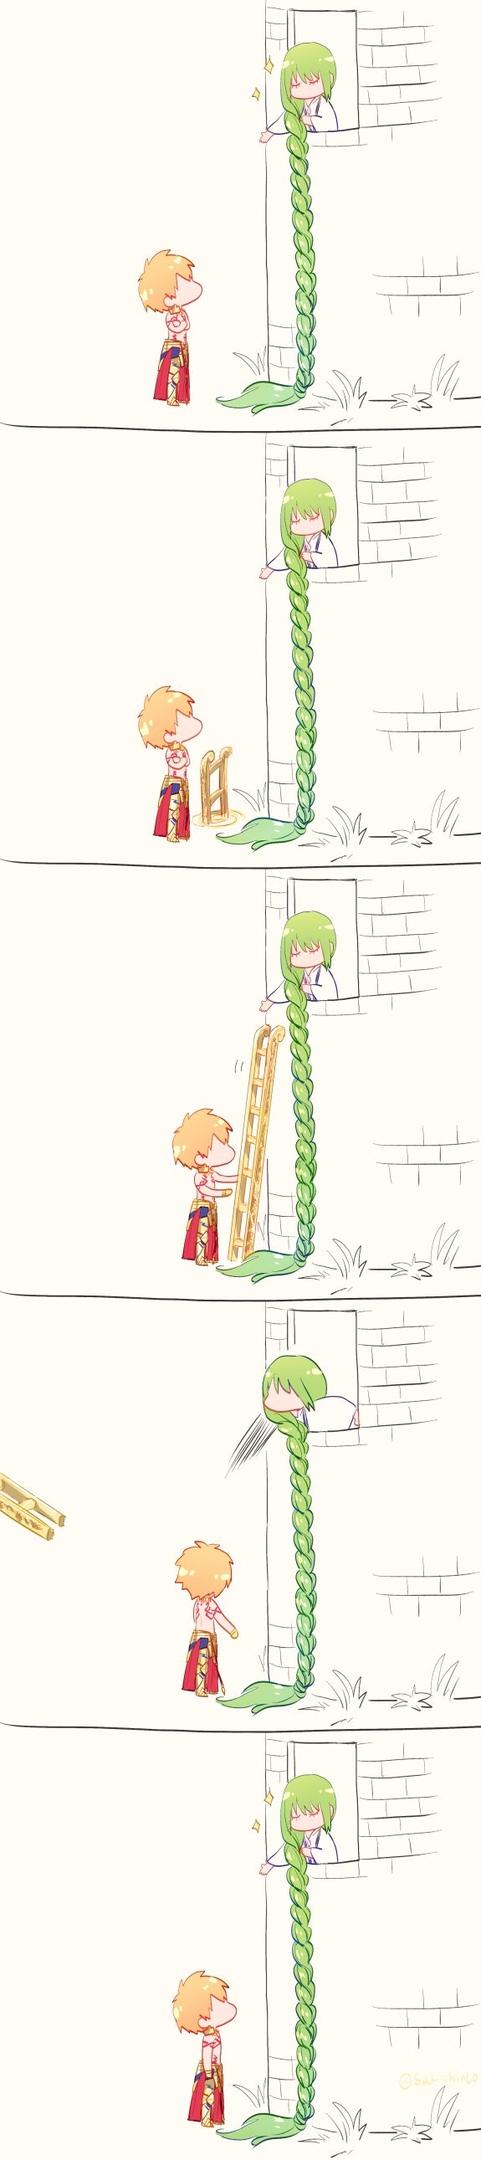 Rapunzel(crossover)